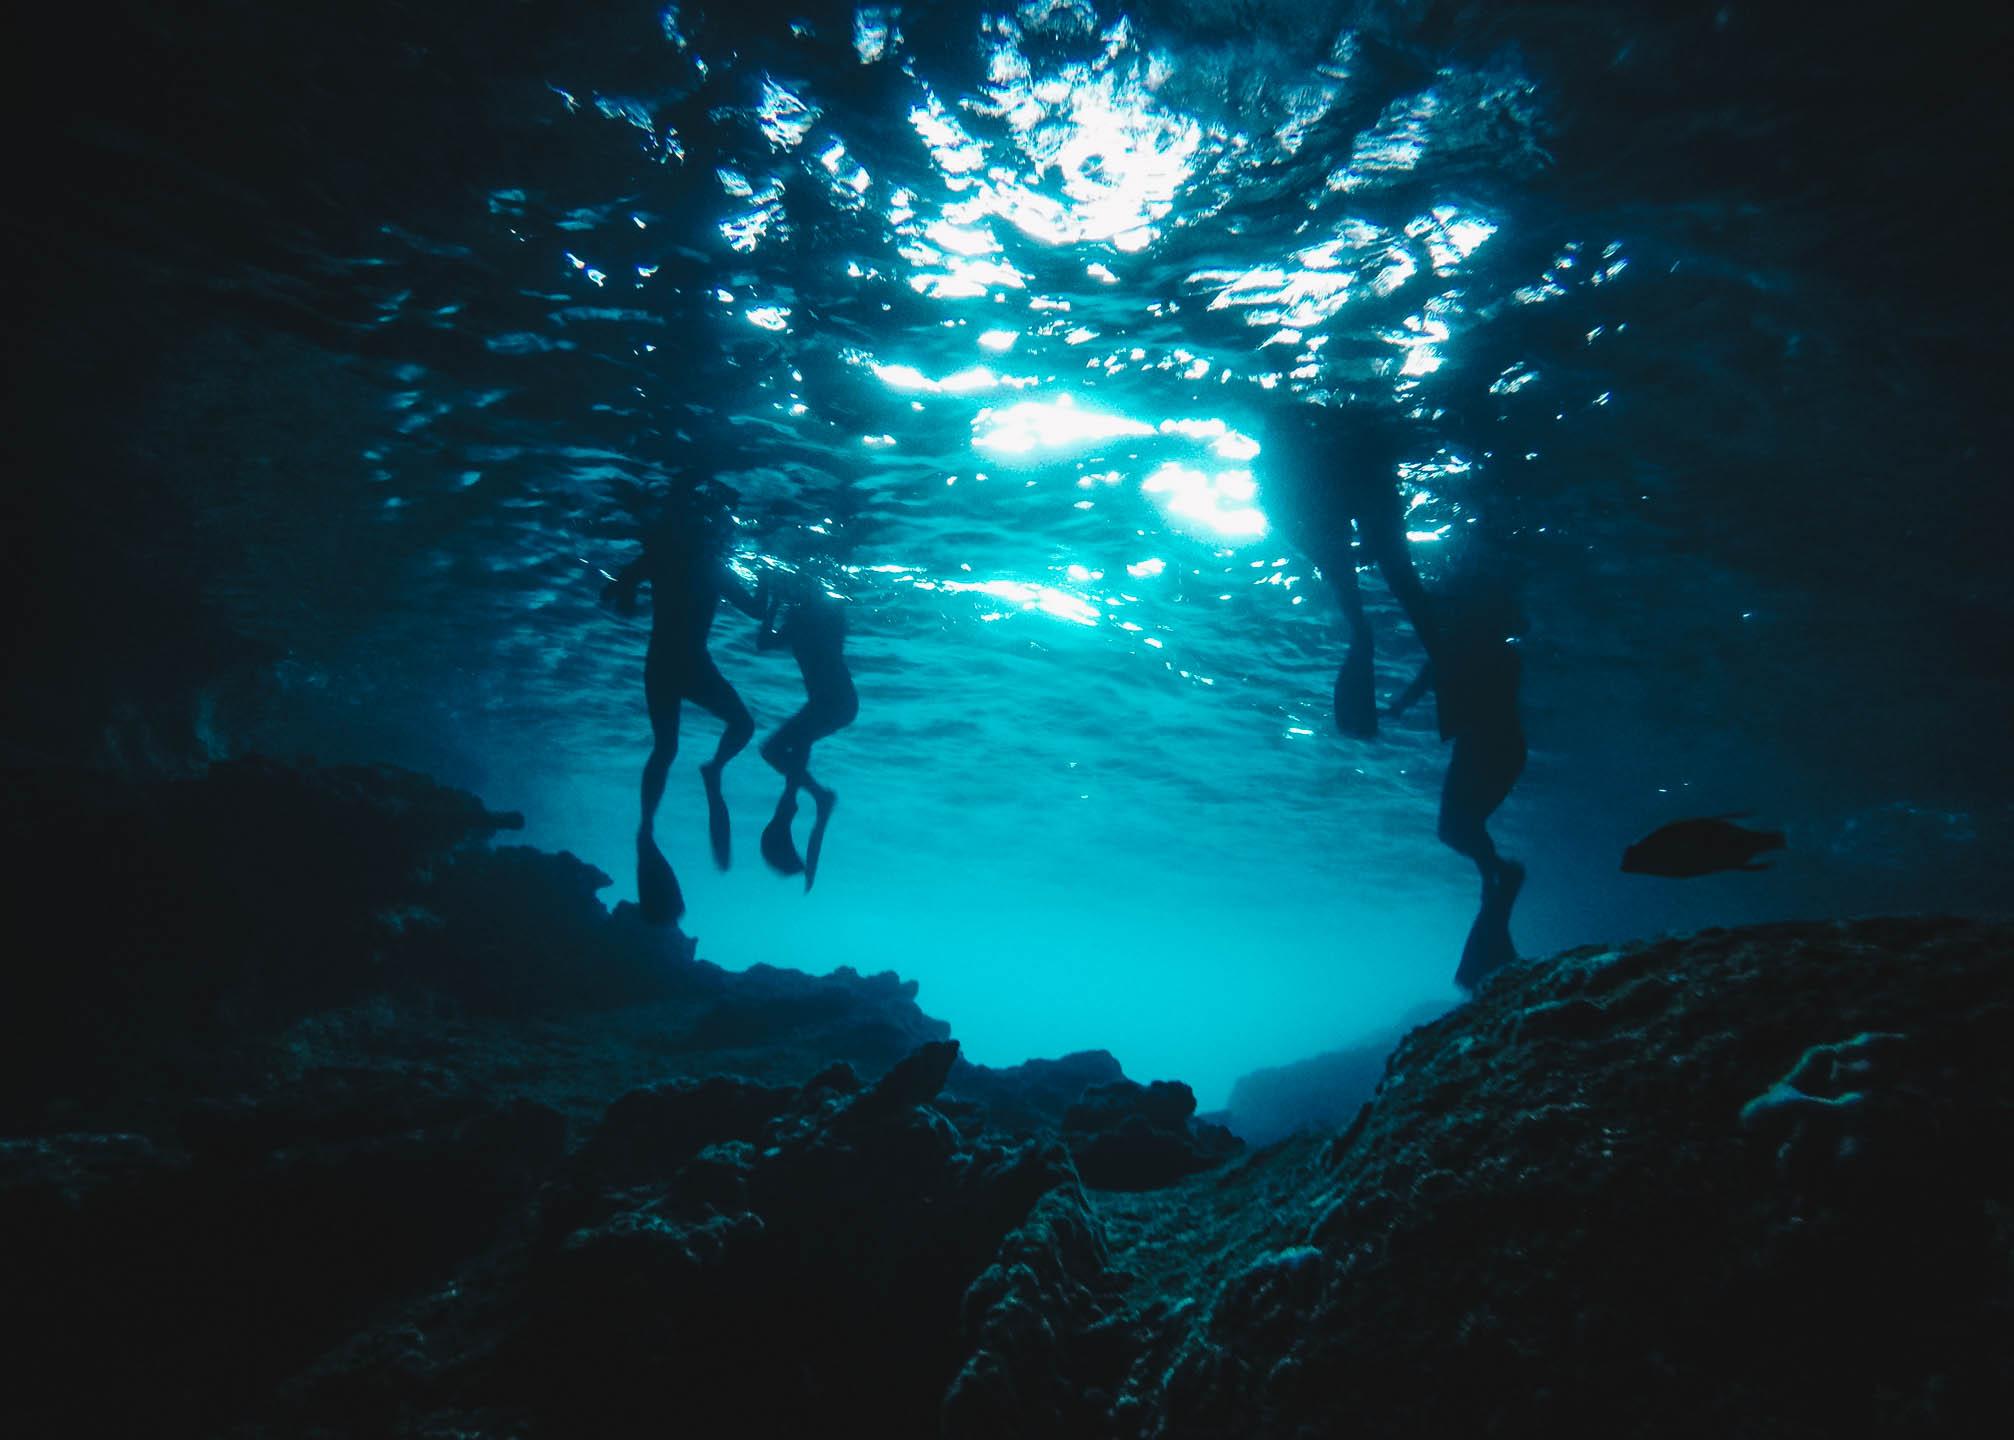 cave gopro thailand